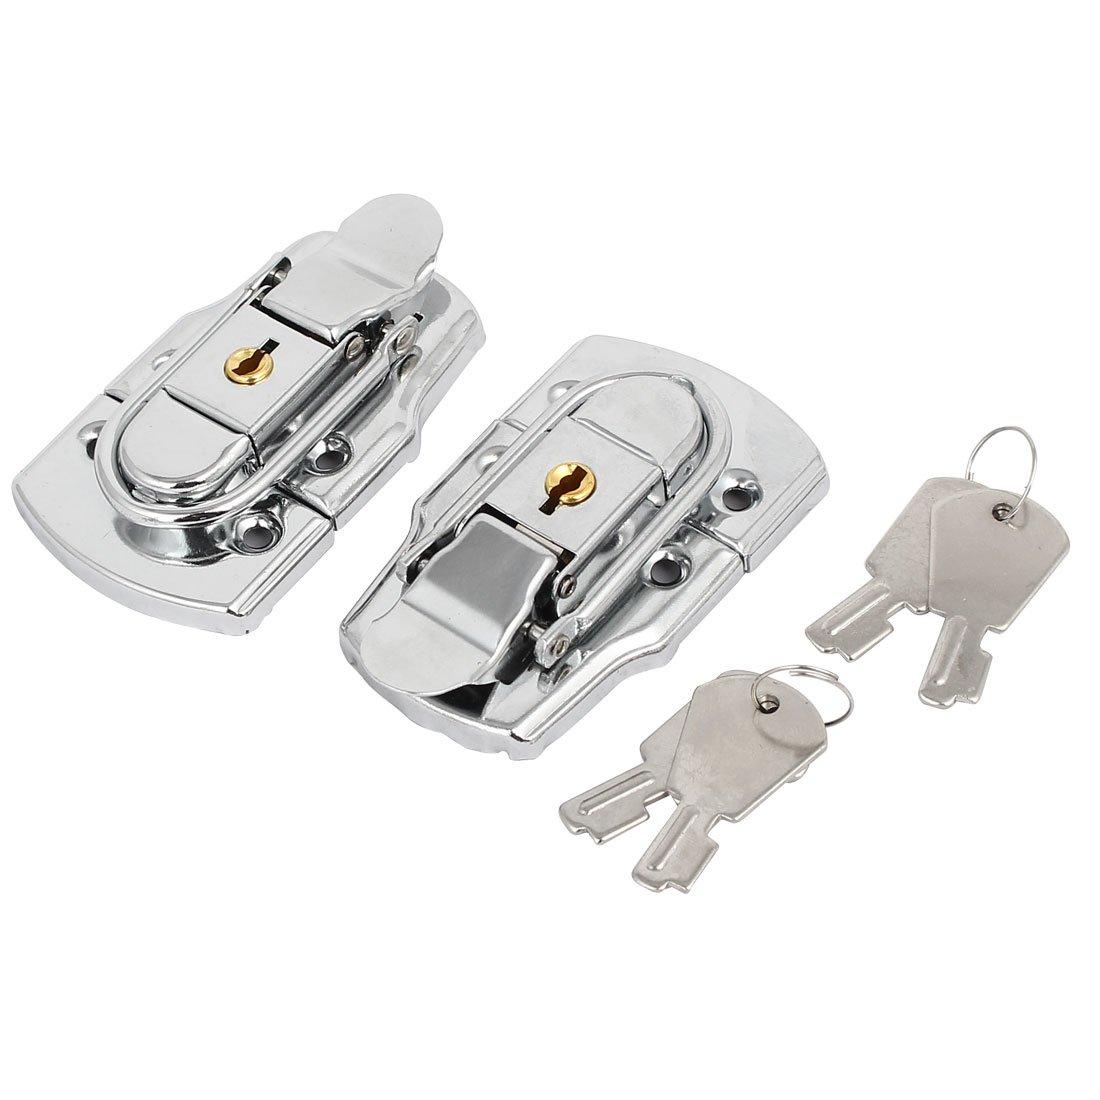 uxcell Toolbox Case 77x45x15mm Metal Box Toggle Latches Hasps Keyed Locks Silver Tone 2pcs